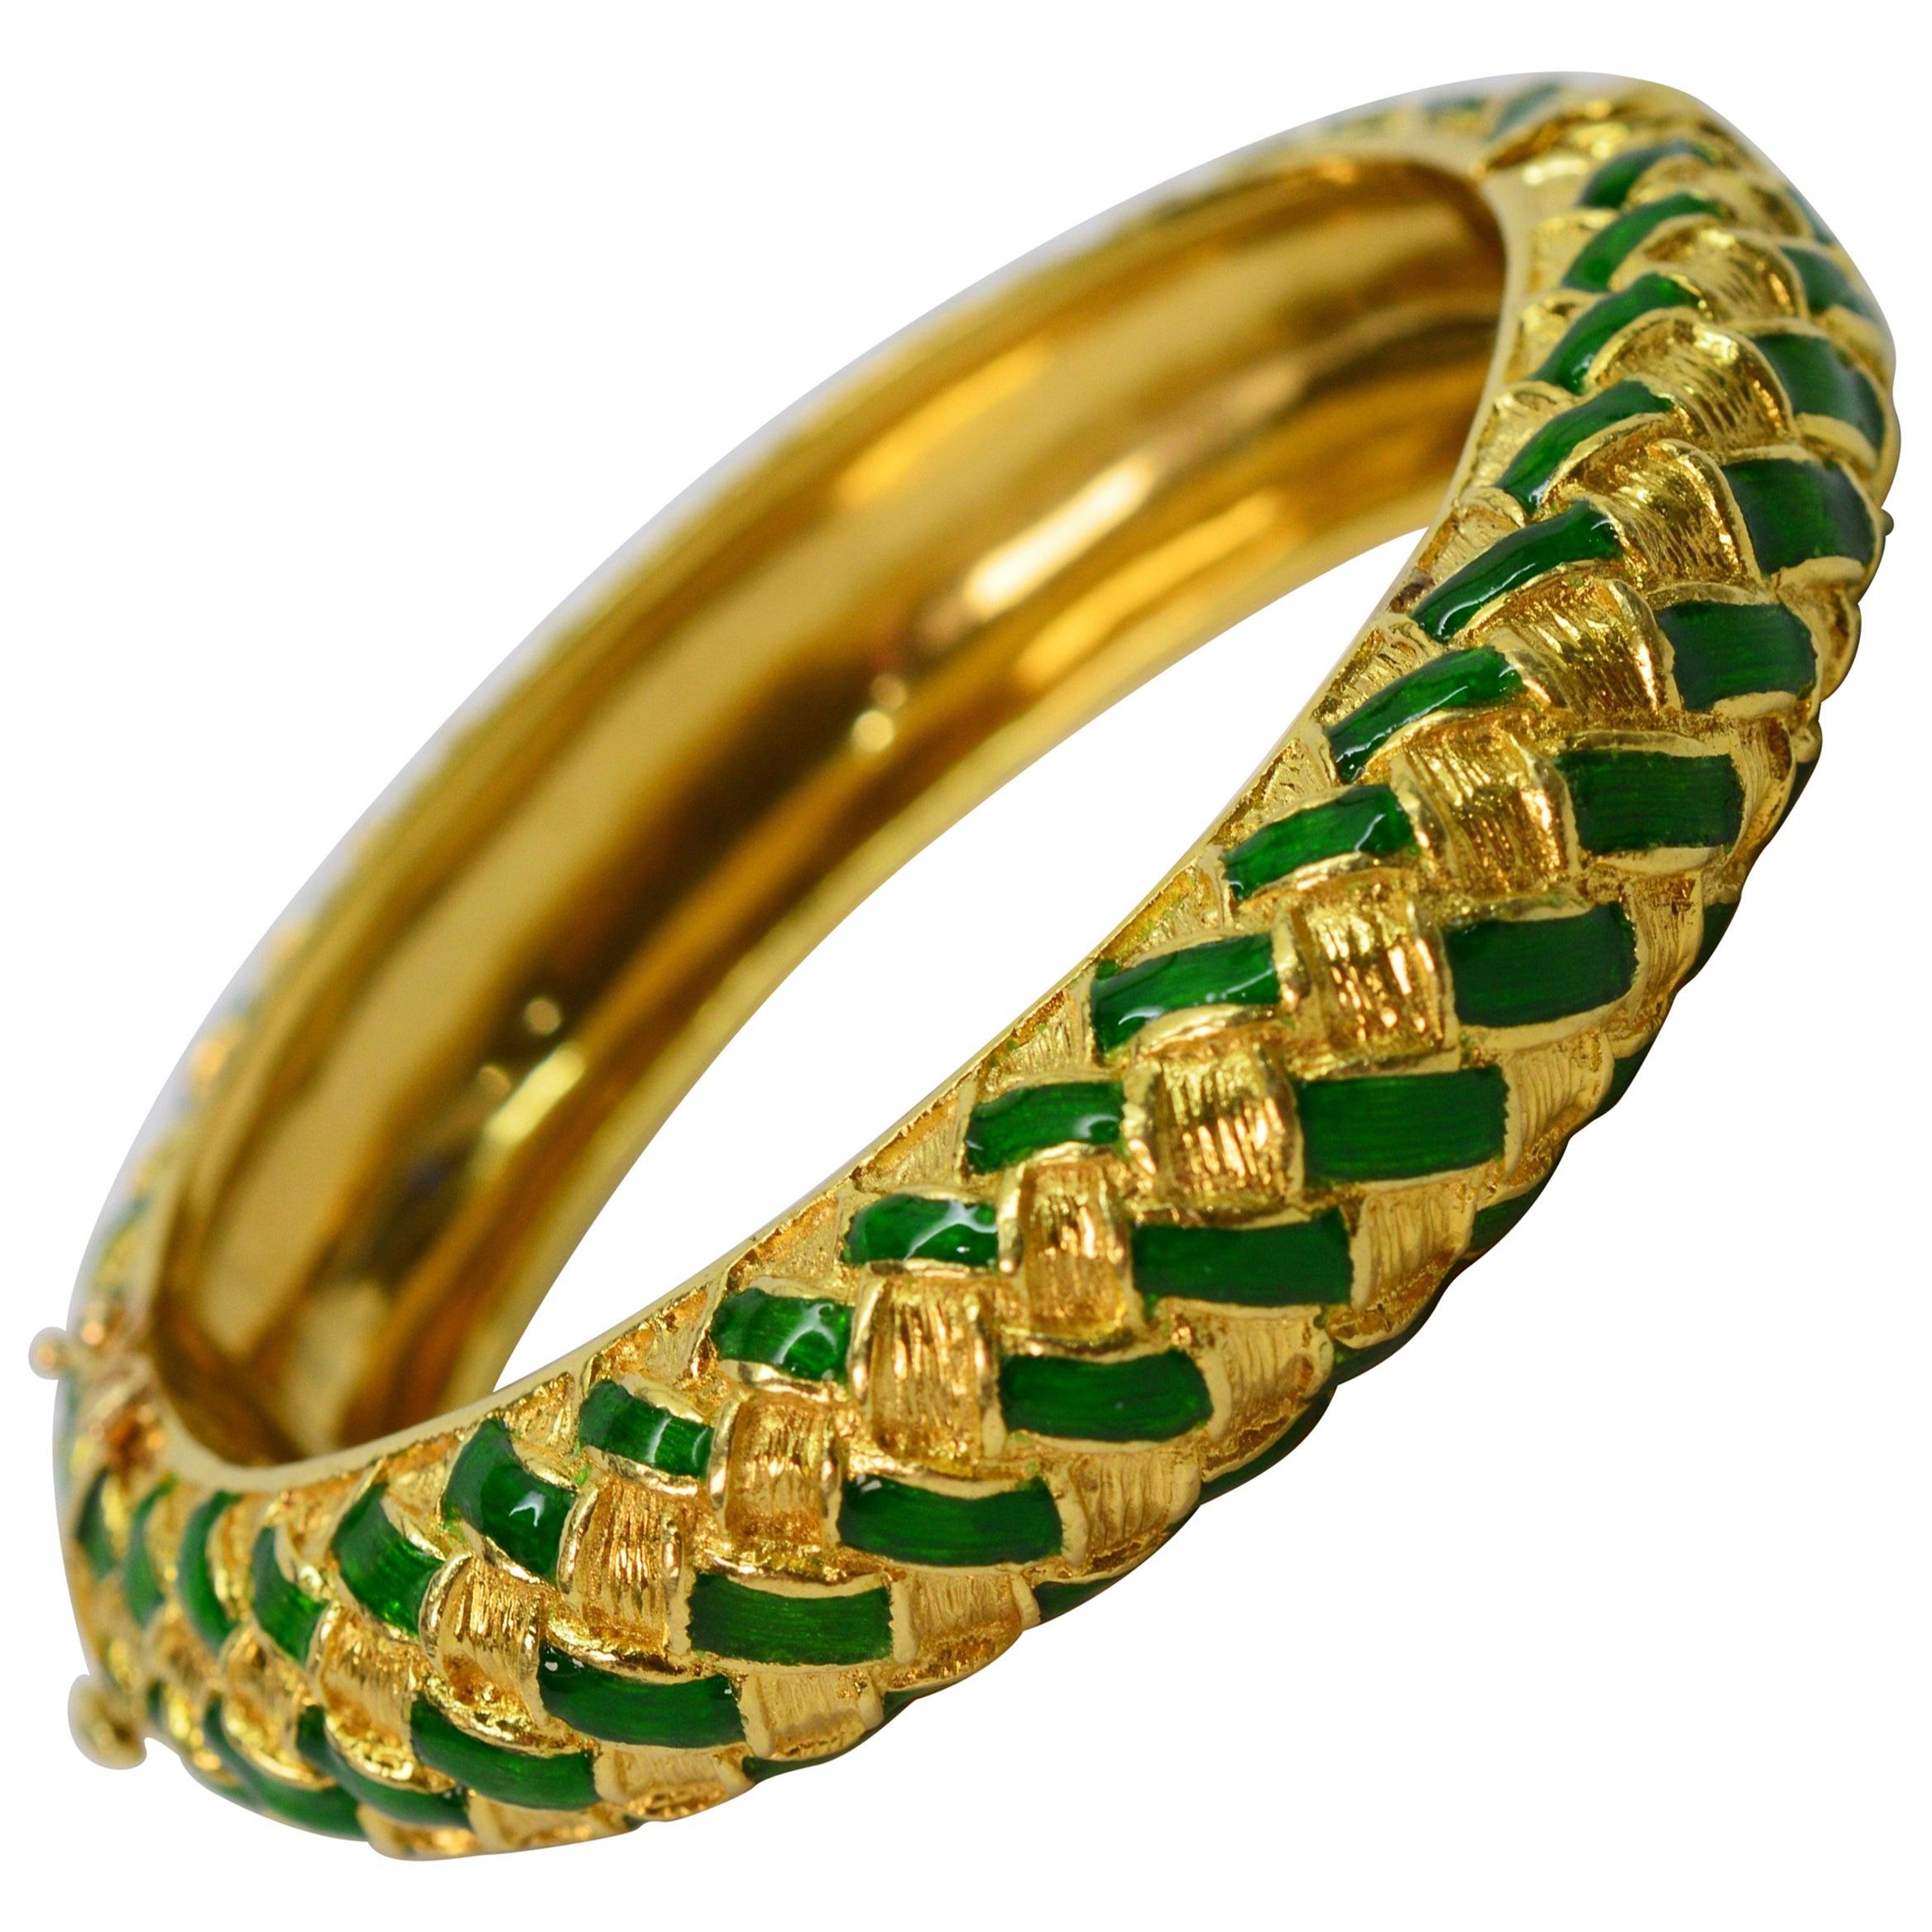 Tiffany & Co. Green Enamel Yellow Gold Basket Weave Bangle Bracelet